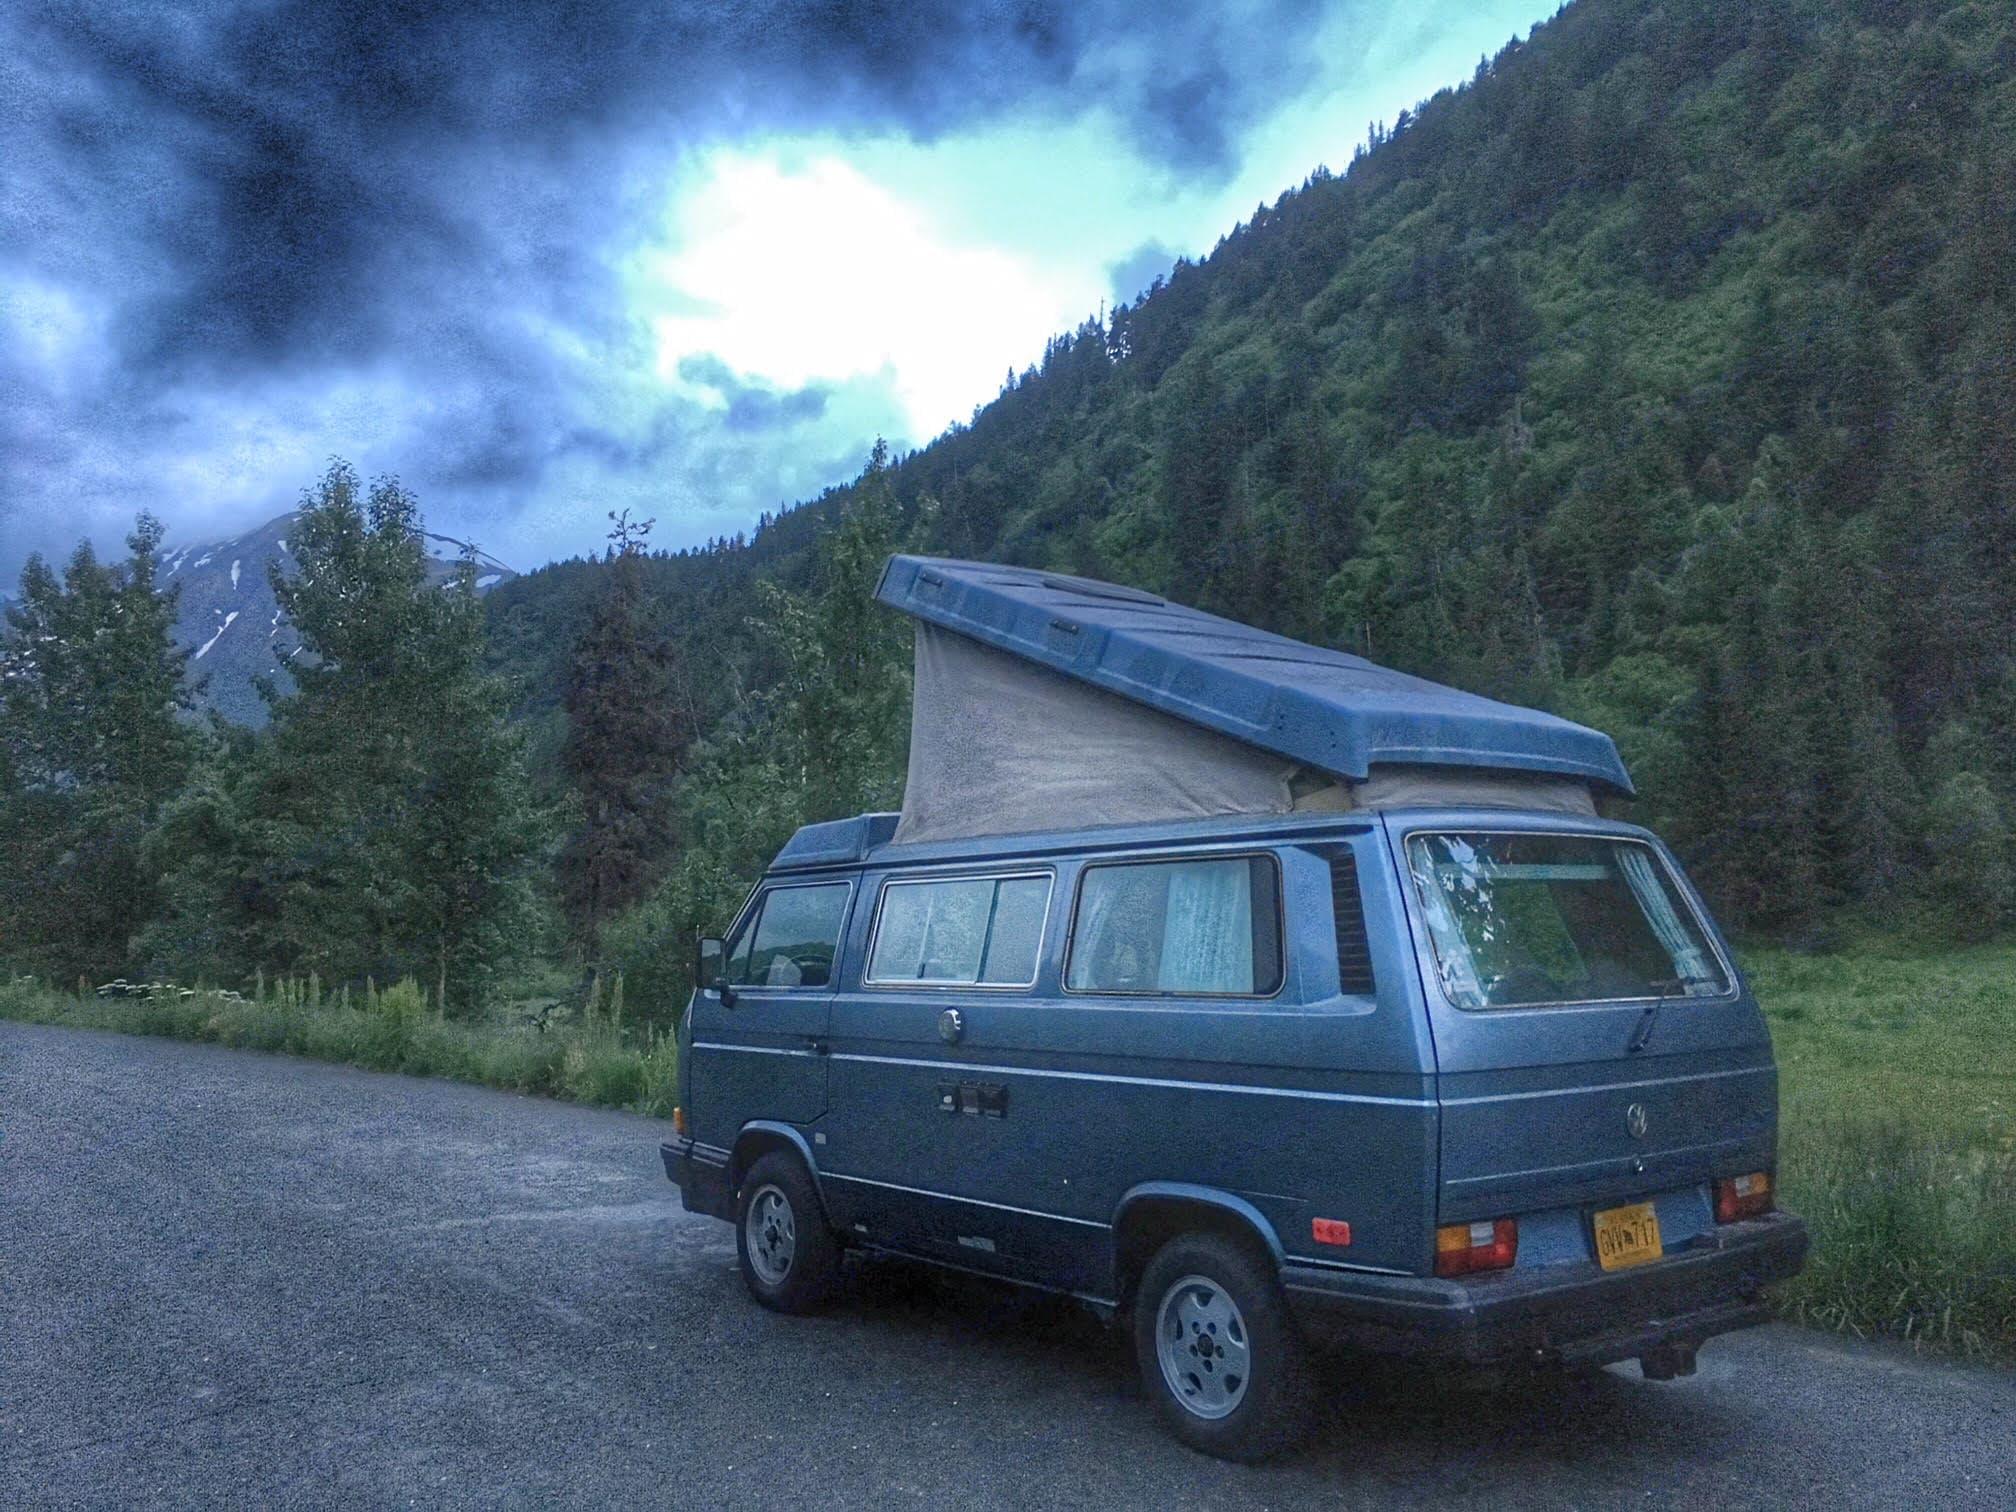 Clark camping by Tern Lake. Volkswagen Westfalia 1988